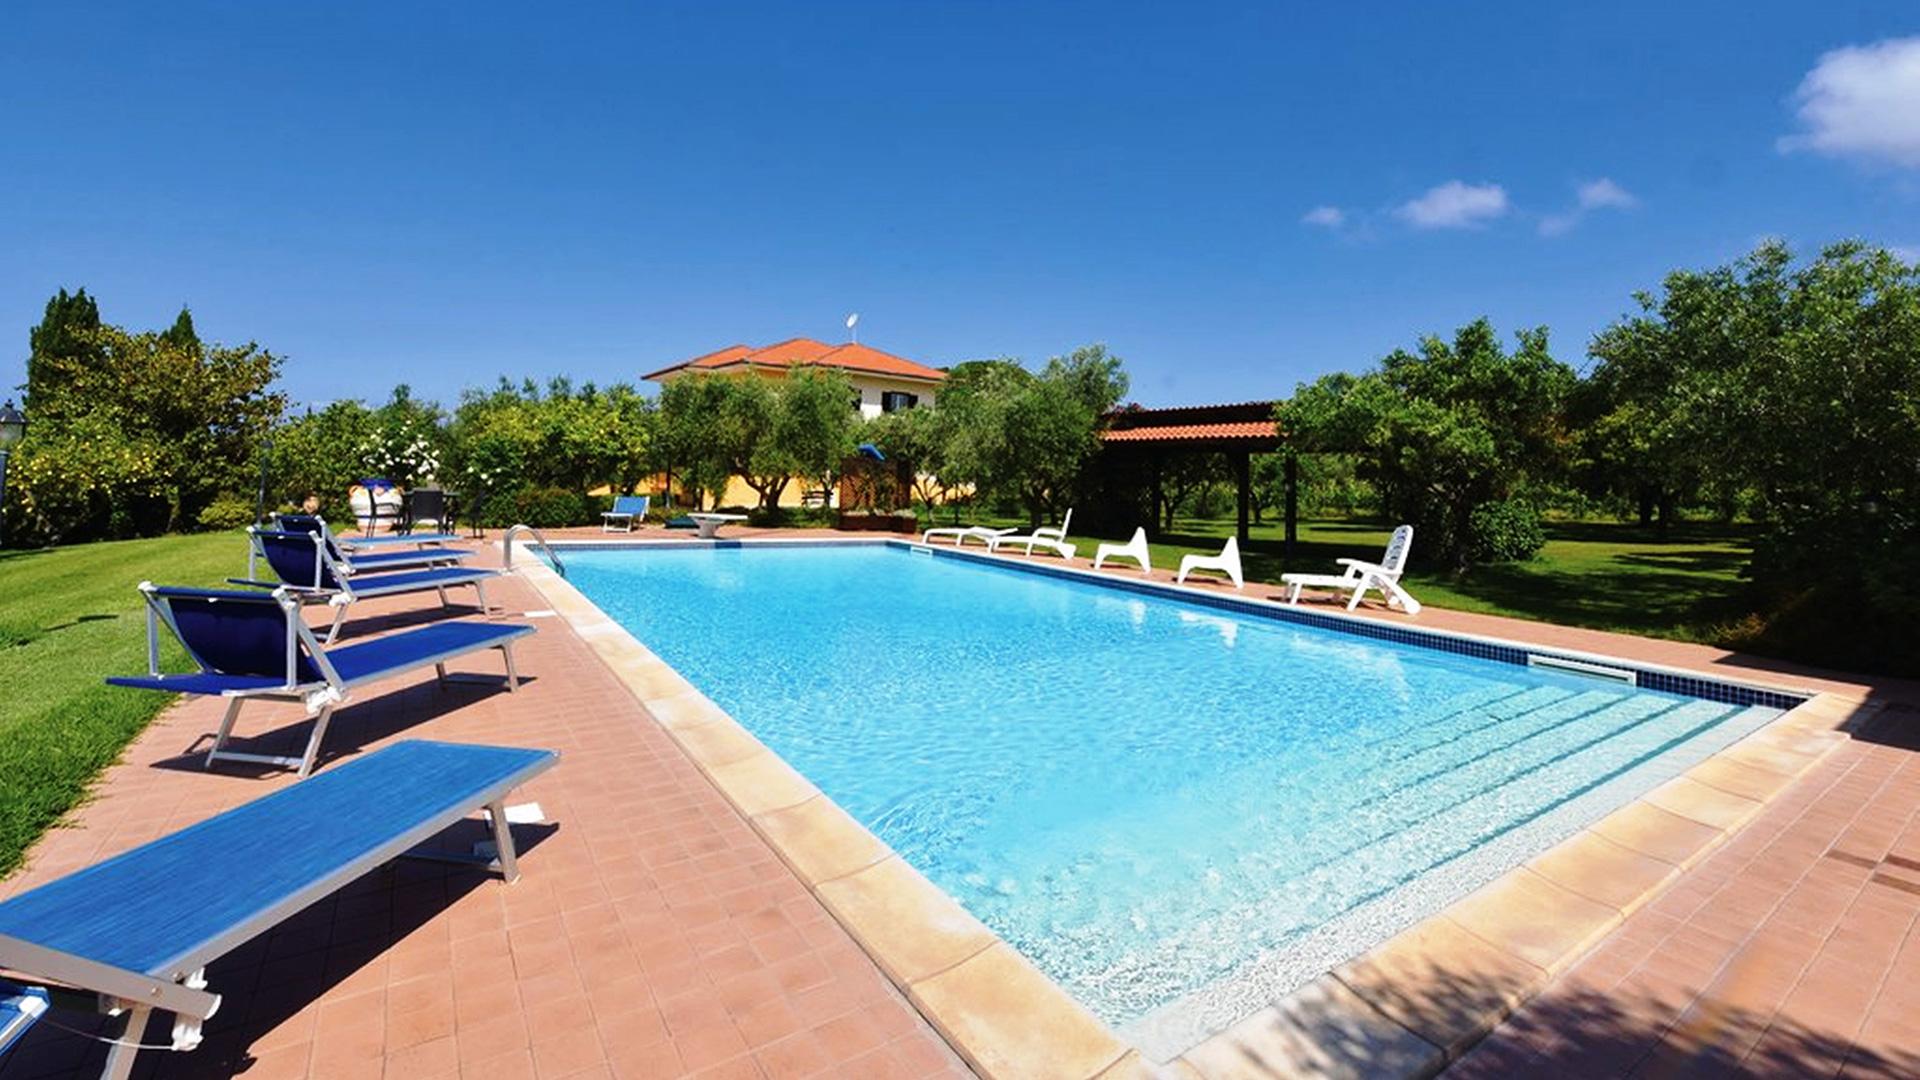 La piscina 2